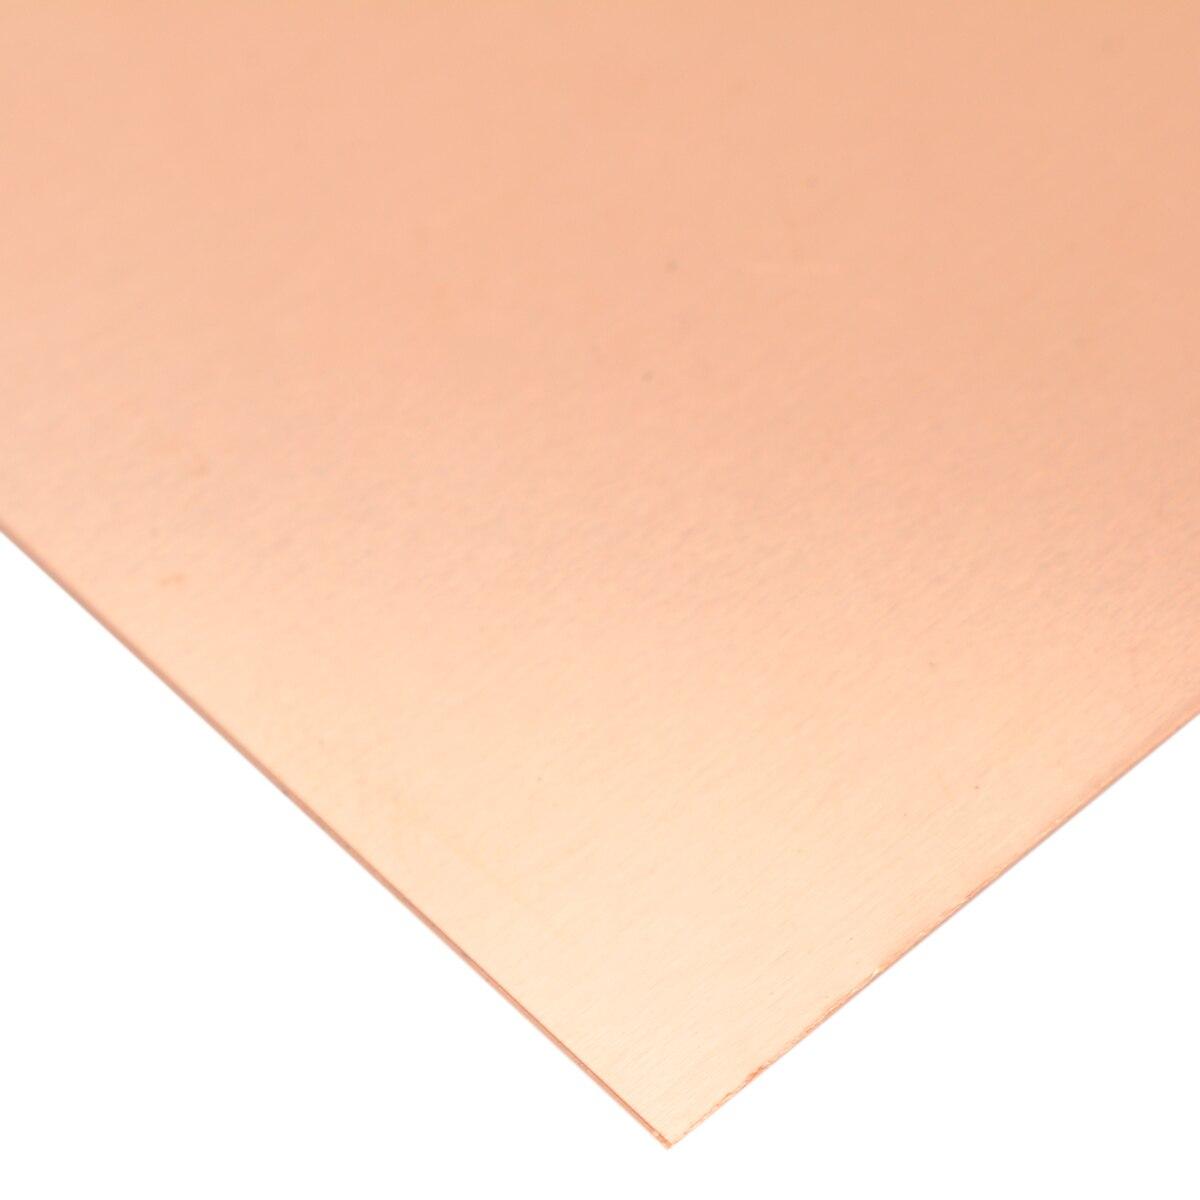 1pc 99.9% Pure High Purity Copper Cu Metal Sheet Foil Copper Plate 100x100mm 0.2mm Thickness